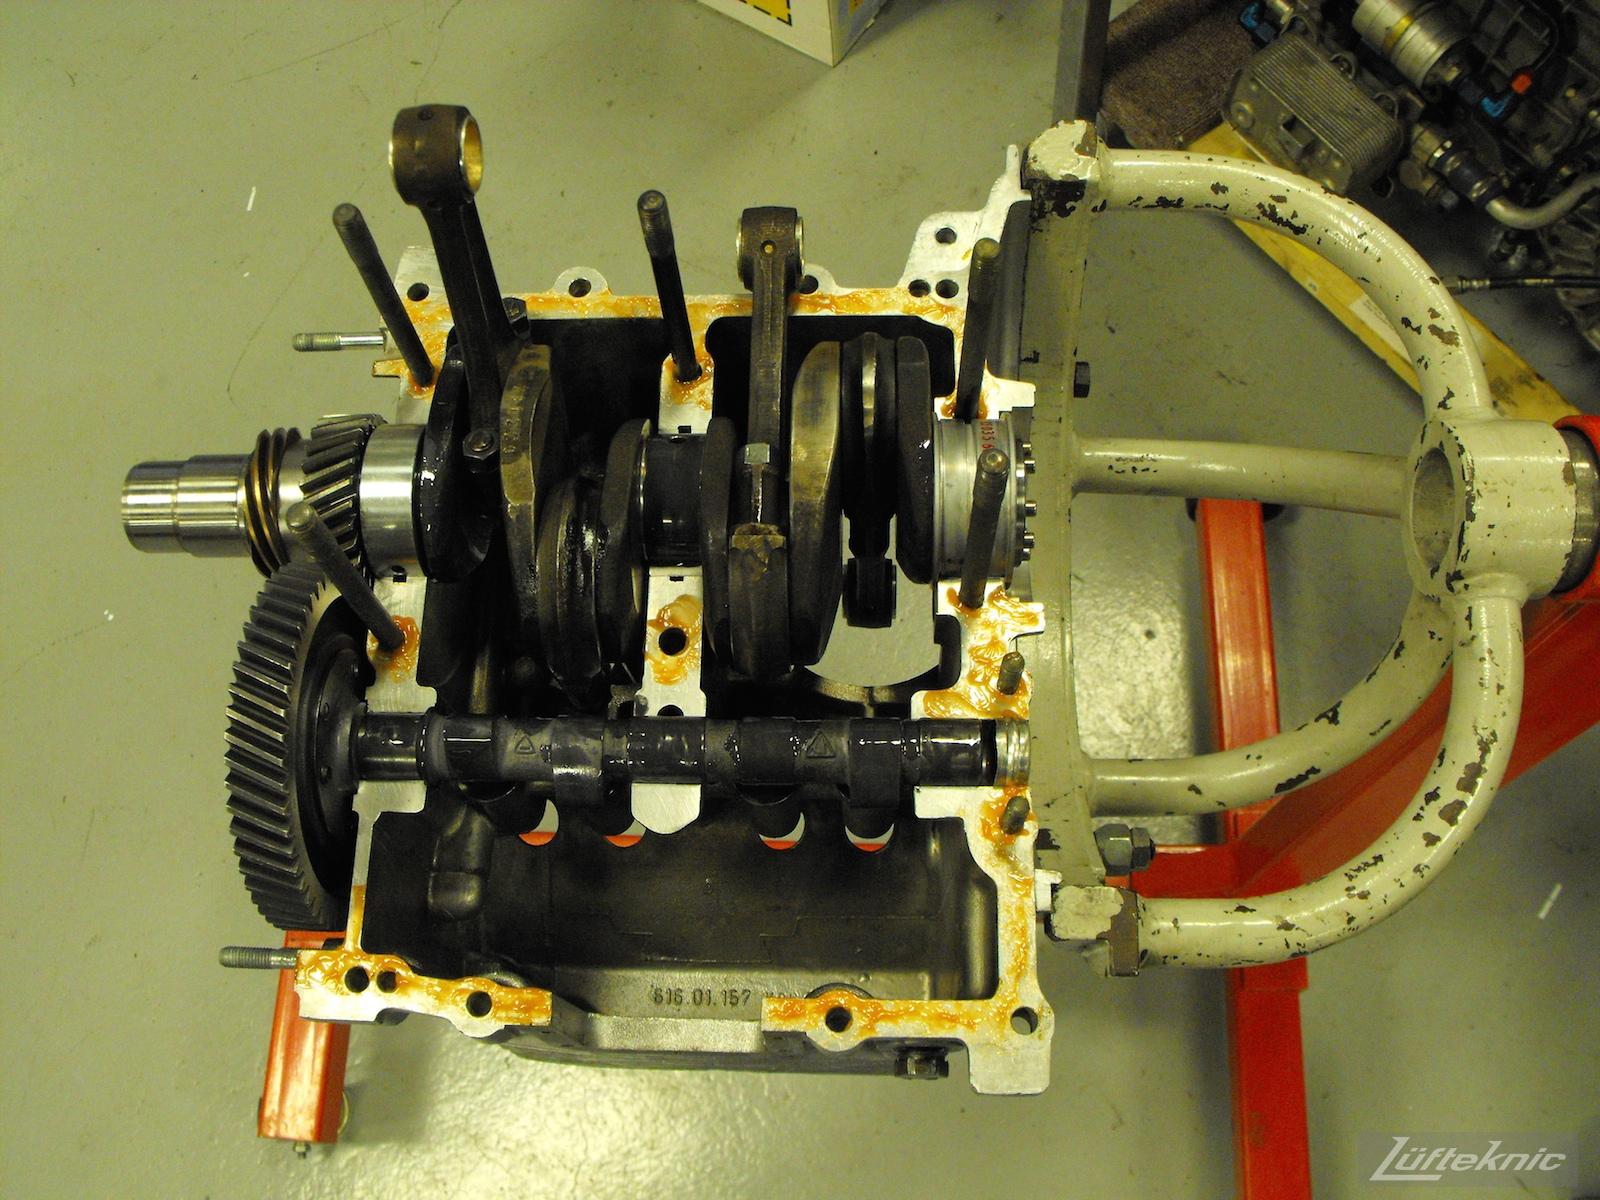 Engine being assembled for a 1961 Porsche 356B Roadster restoration.